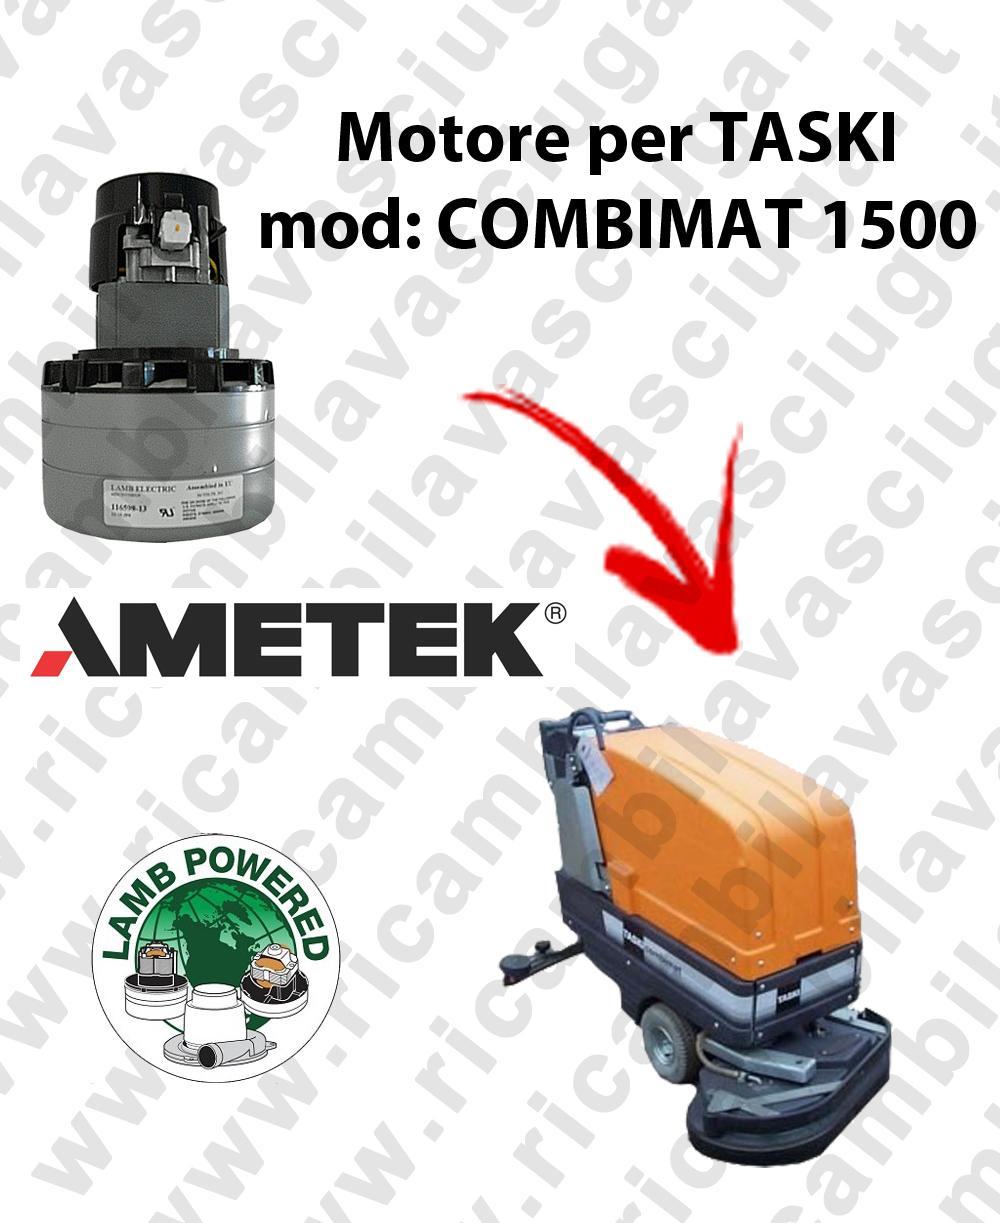 COMBIMAT 1500 MOTORE LAMB AMETEK di aspirazione per lavapavimenti TASKI